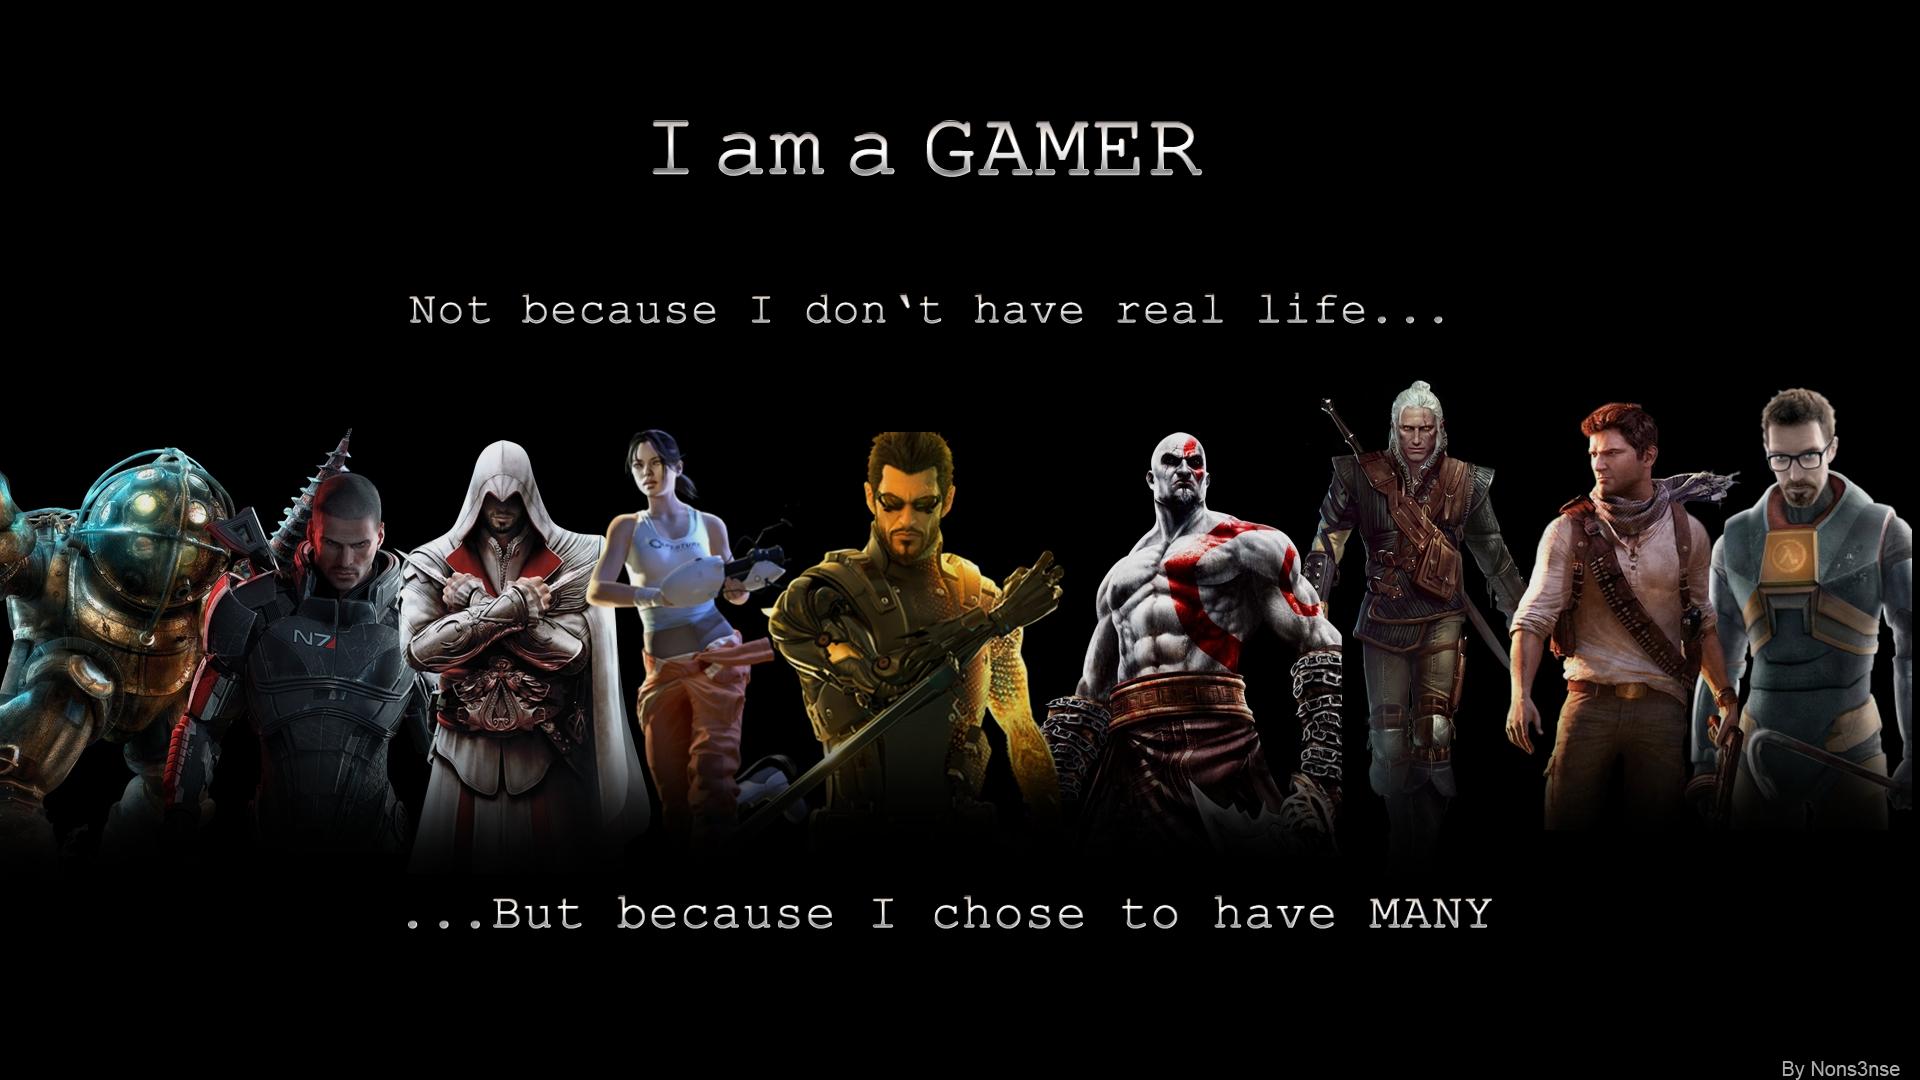 download am a gamer 1920x1080 hd wallpaper #gaming #gamer